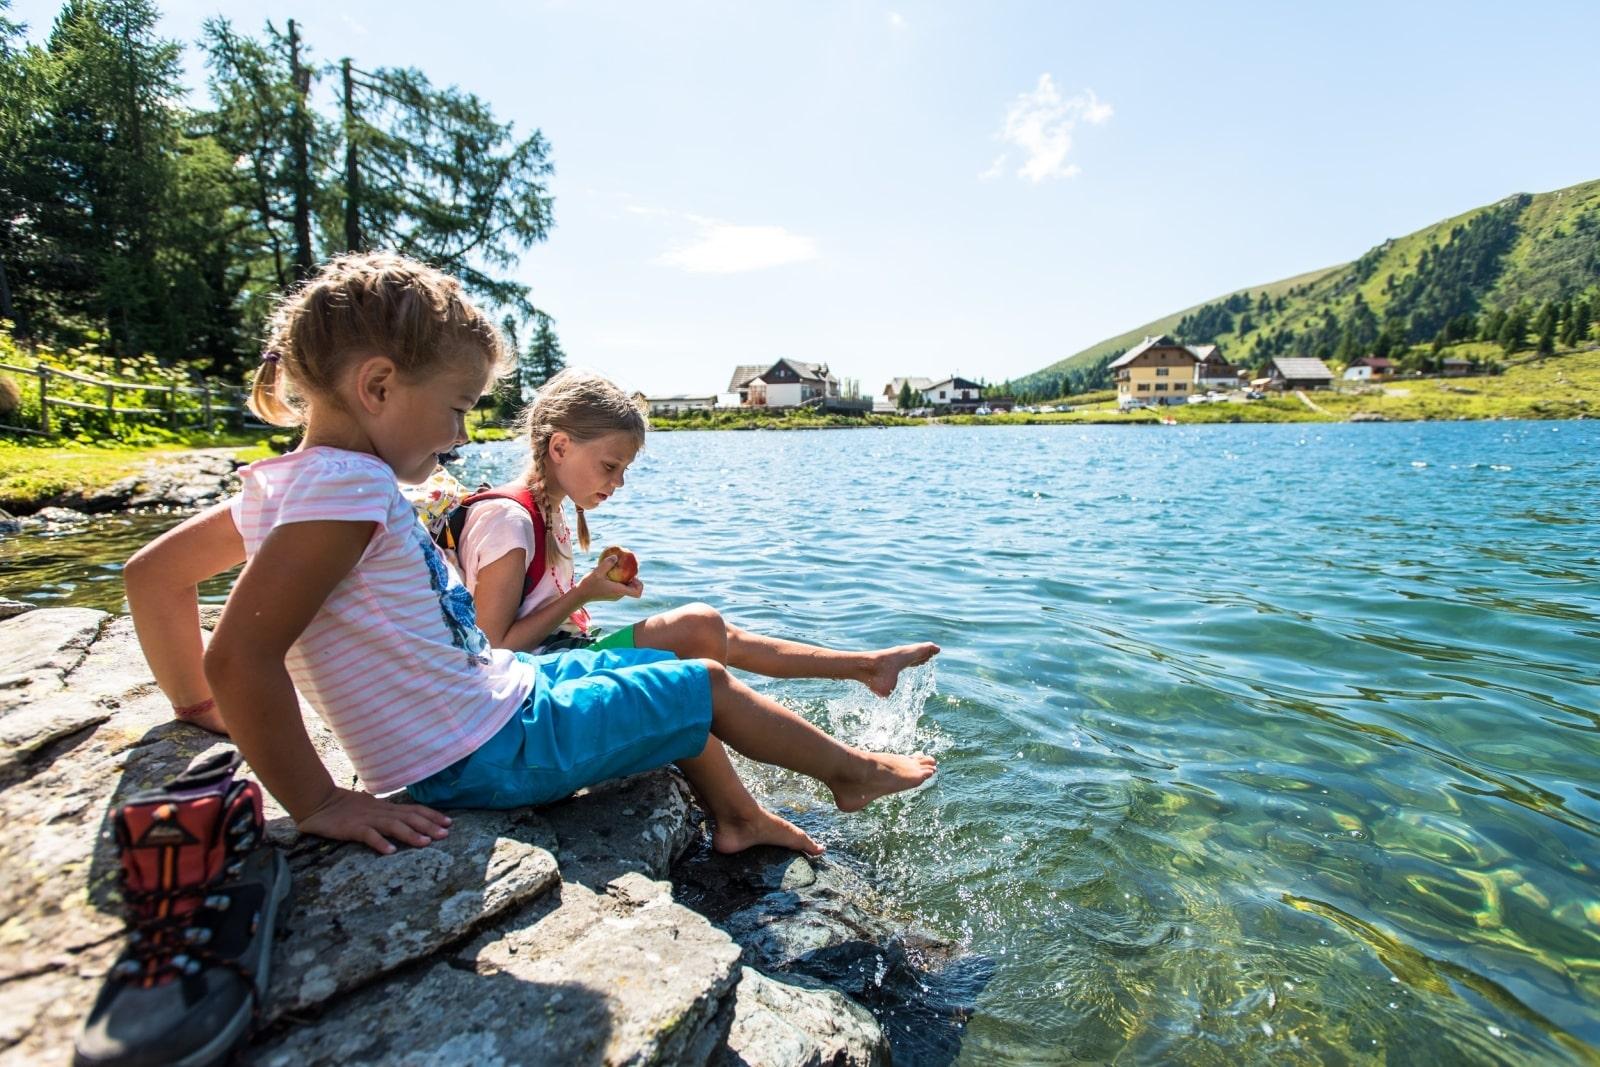 Heidi-Chalet-Falkert-Heidialm-Falkertsee-Kinder-Bergsee